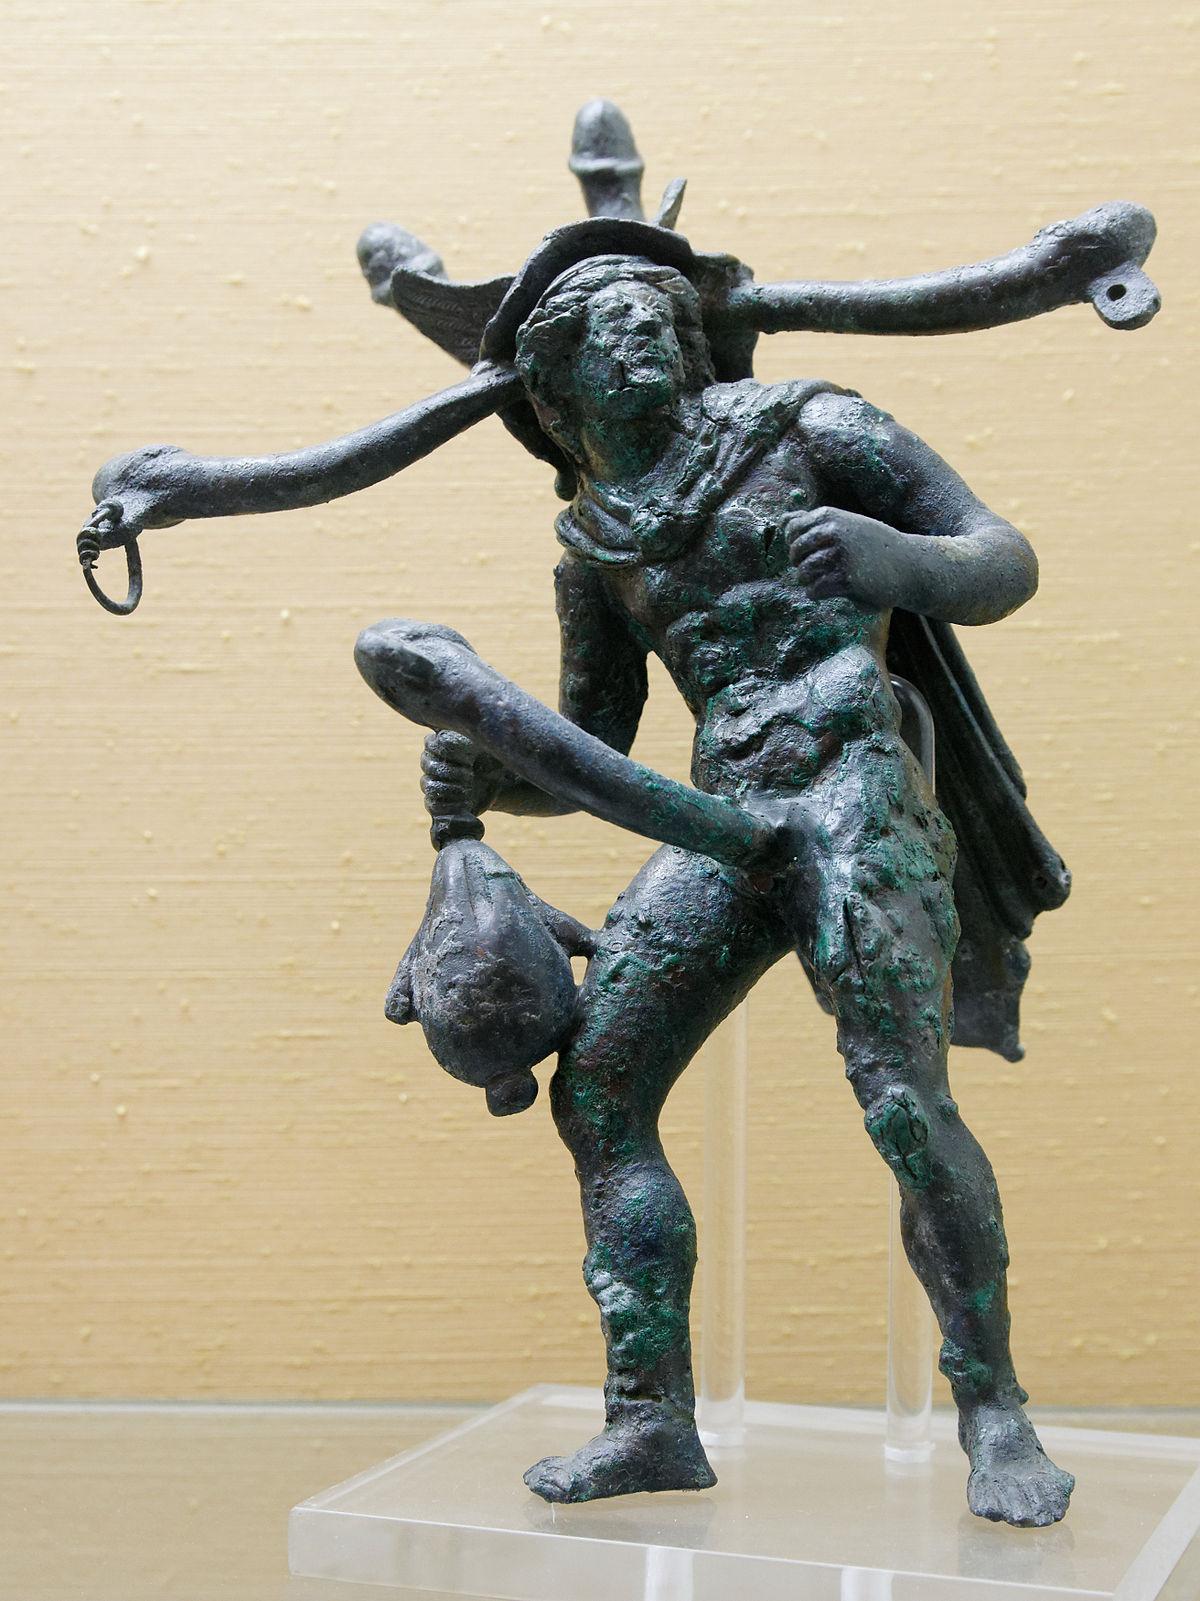 Tintinnabulum Ancient Rome Wikipedia